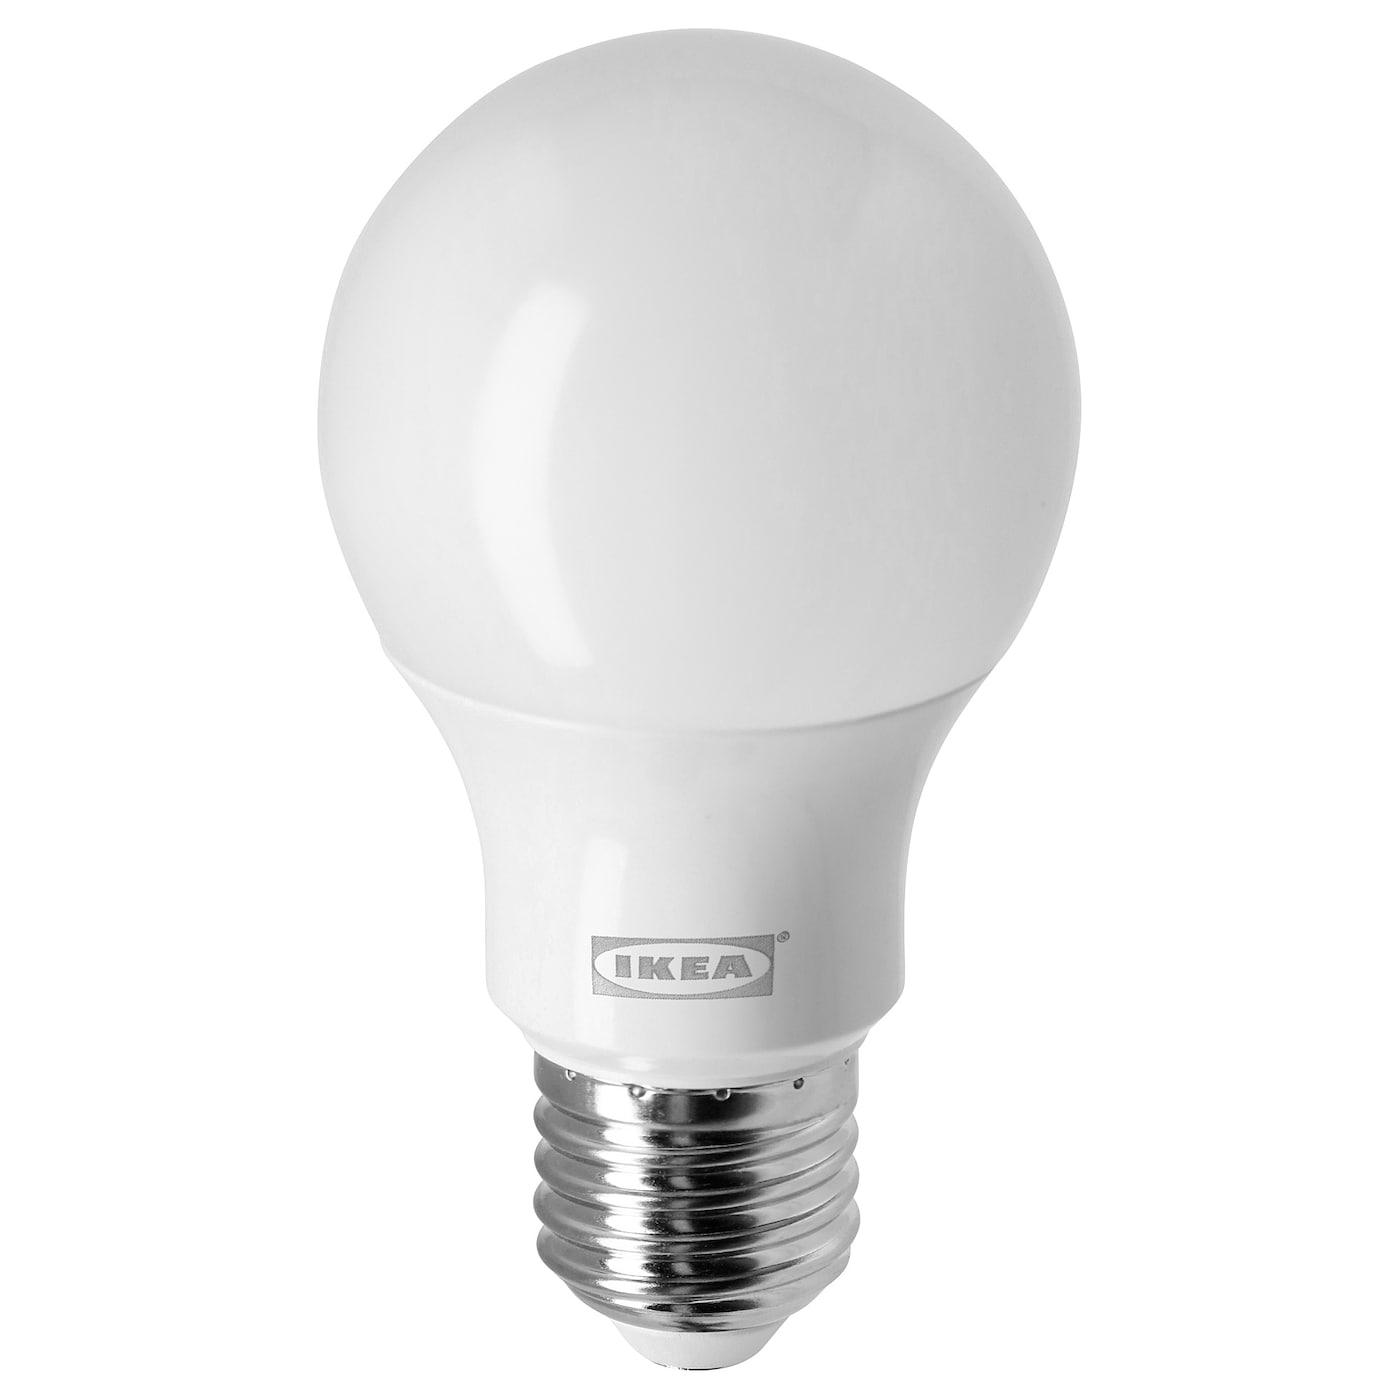 RYET LED-Leuchtmittel E27 470 lm, rund opalweiß